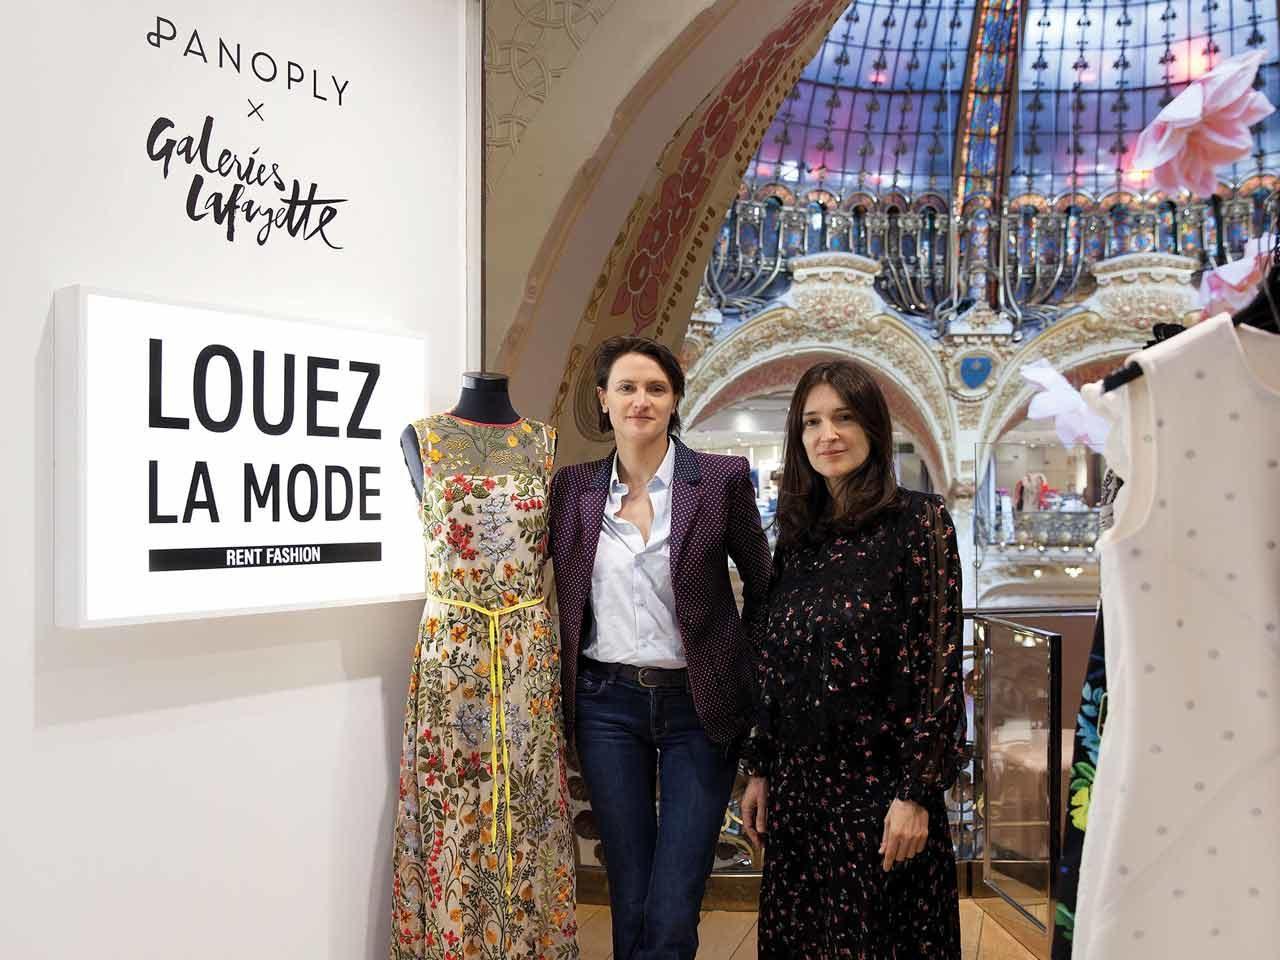 Emmanuelle Brizay et Ingrid Brochard fondatrices de Panoply